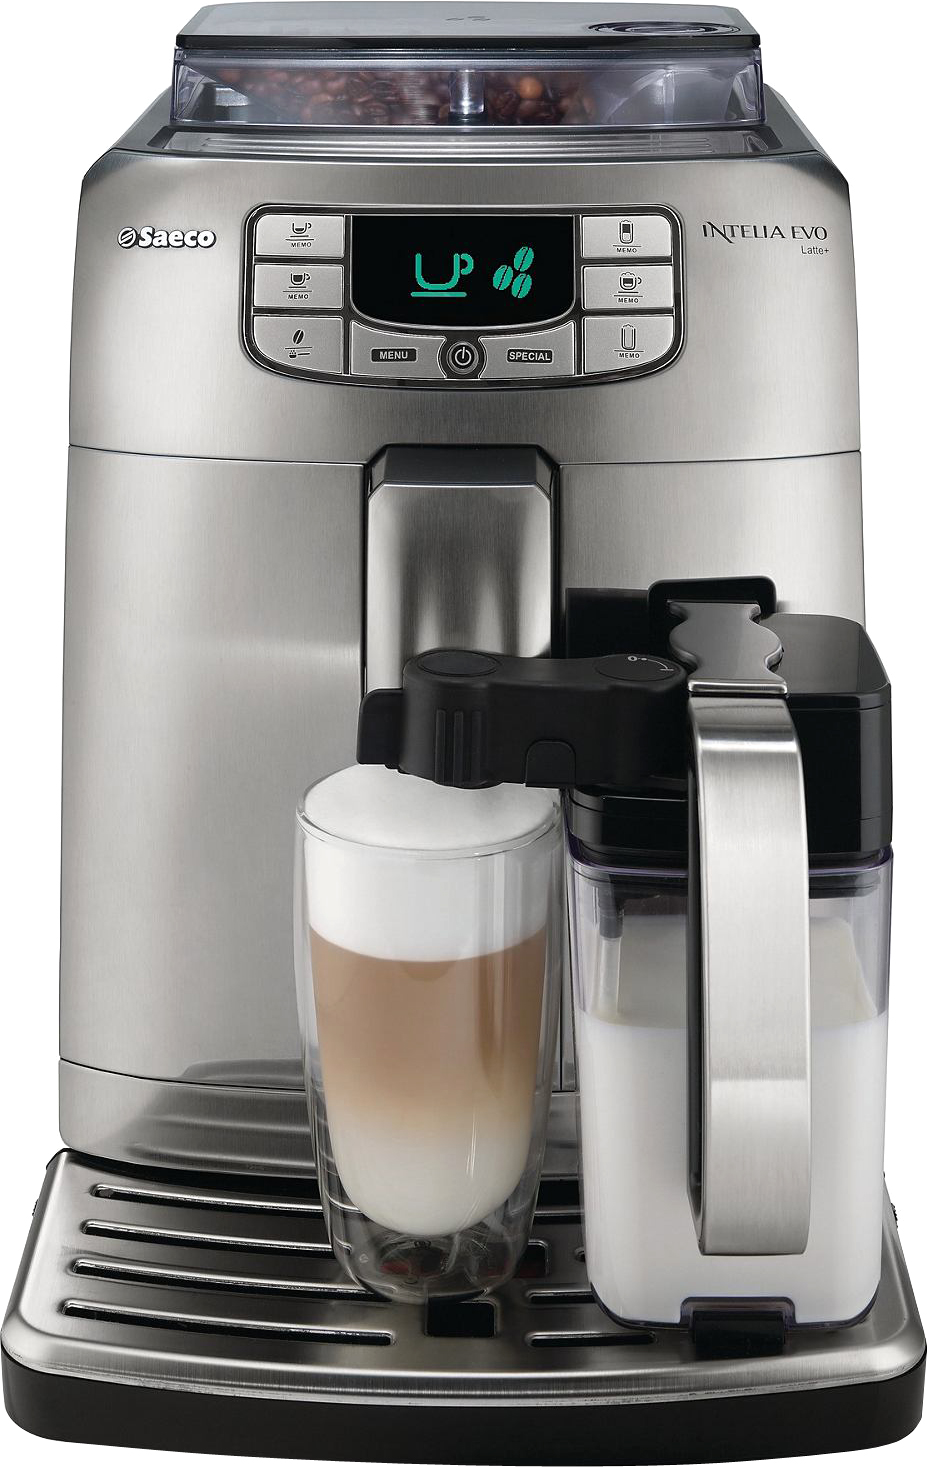 INTELIA-Evo Latte (HD8754/19) 21vek.by 11869000.000